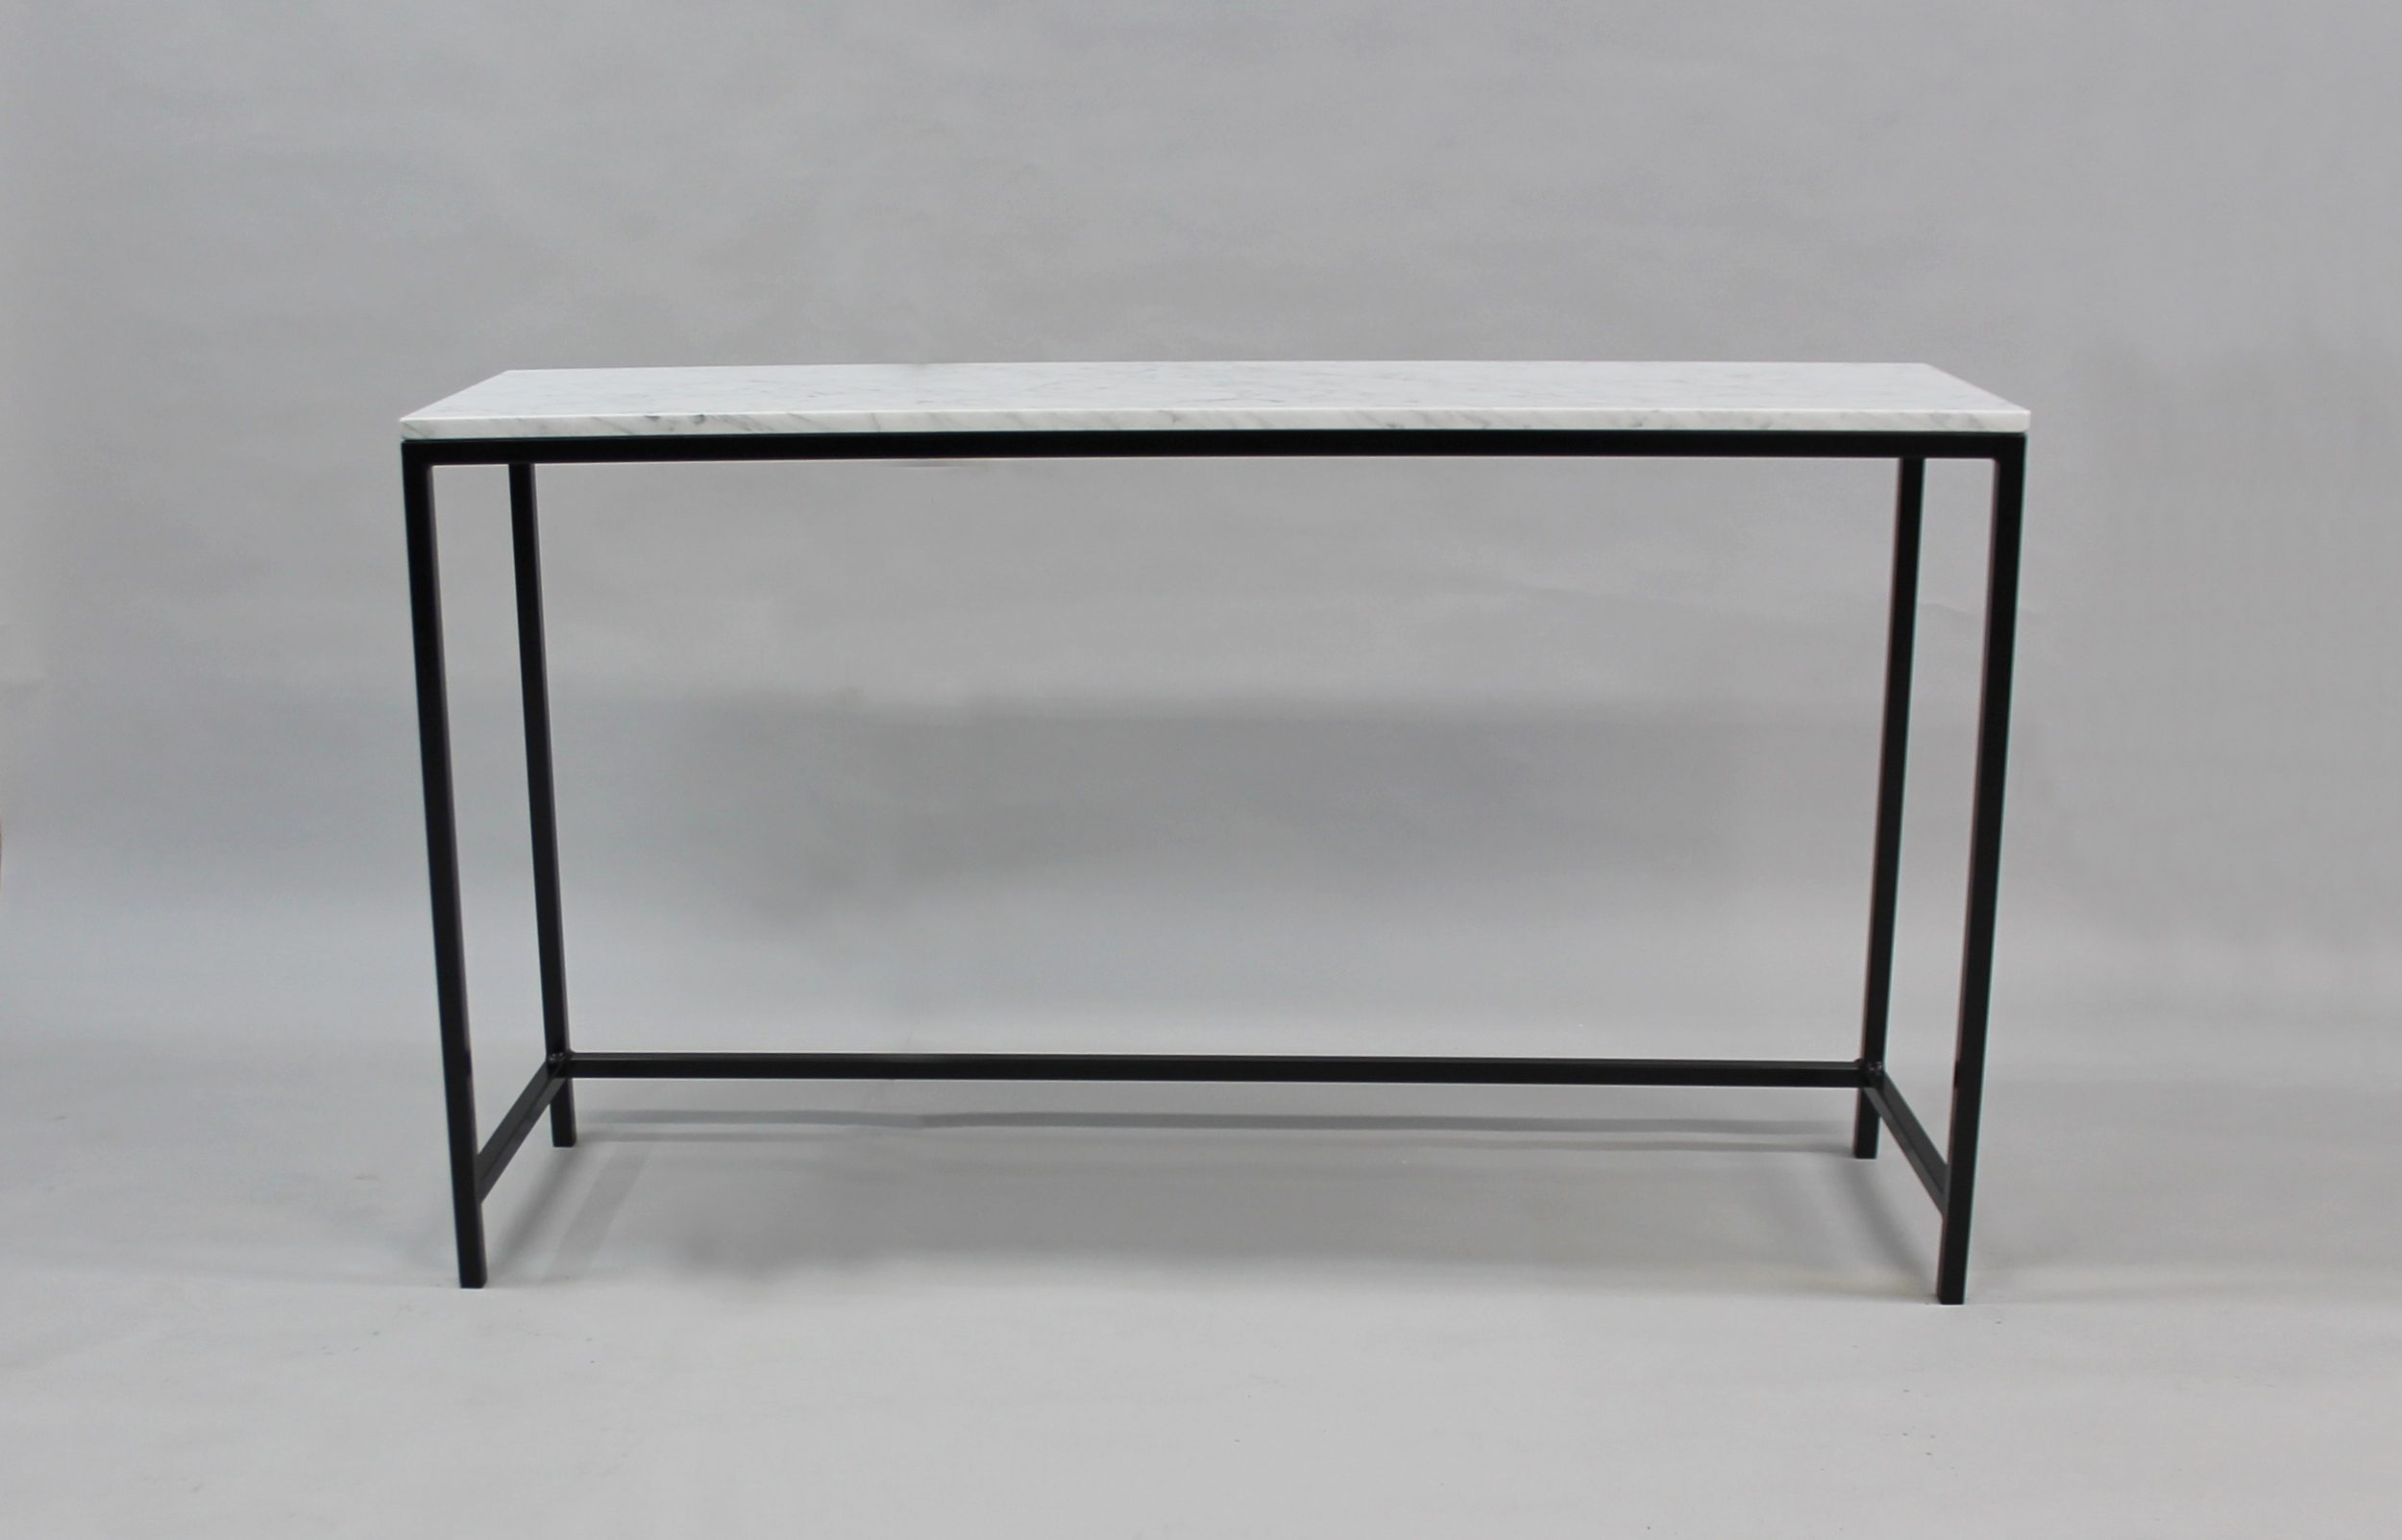 Marmordbord, vit  - 120x30x74 cm, svart underrede  Pris 6 000 :-  inkl frakt   Finns även i 140x40x74 cm -    Pris 7000:- inkl frakt